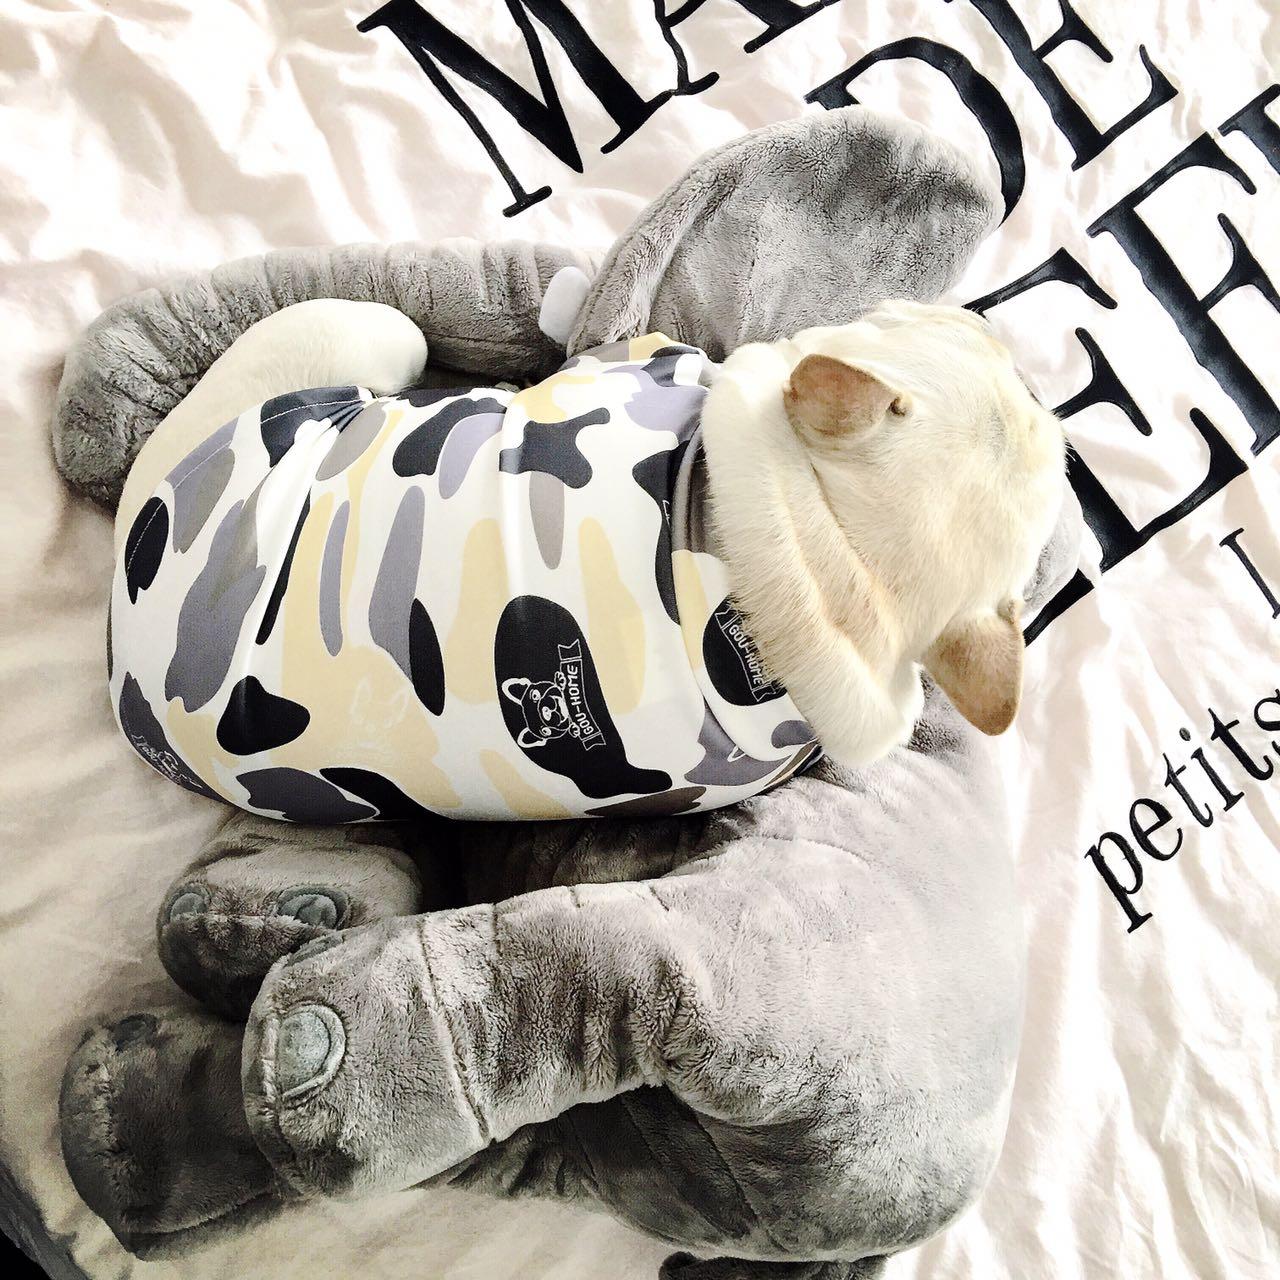 Собака одежда франция борьба весна T футболки пакистан брат камуфляж шаблон английский корова небольшой собаки тедди топорище база борьба корова собака лето